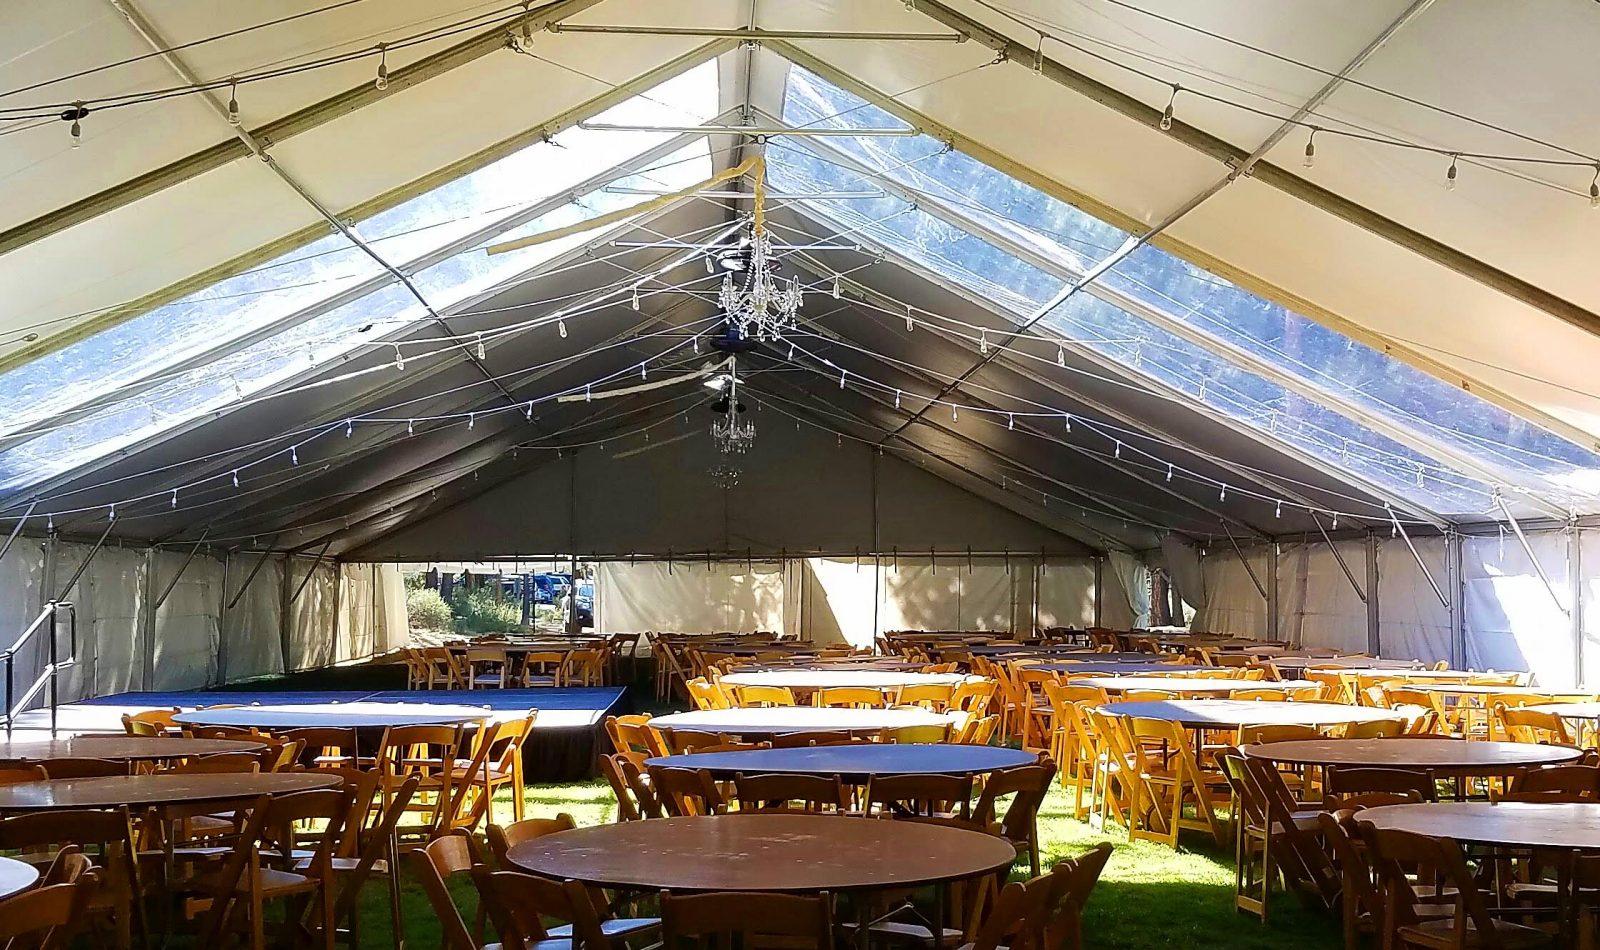 chair table rental swivel dinette sets edison lighting bend party rentals oregon tent